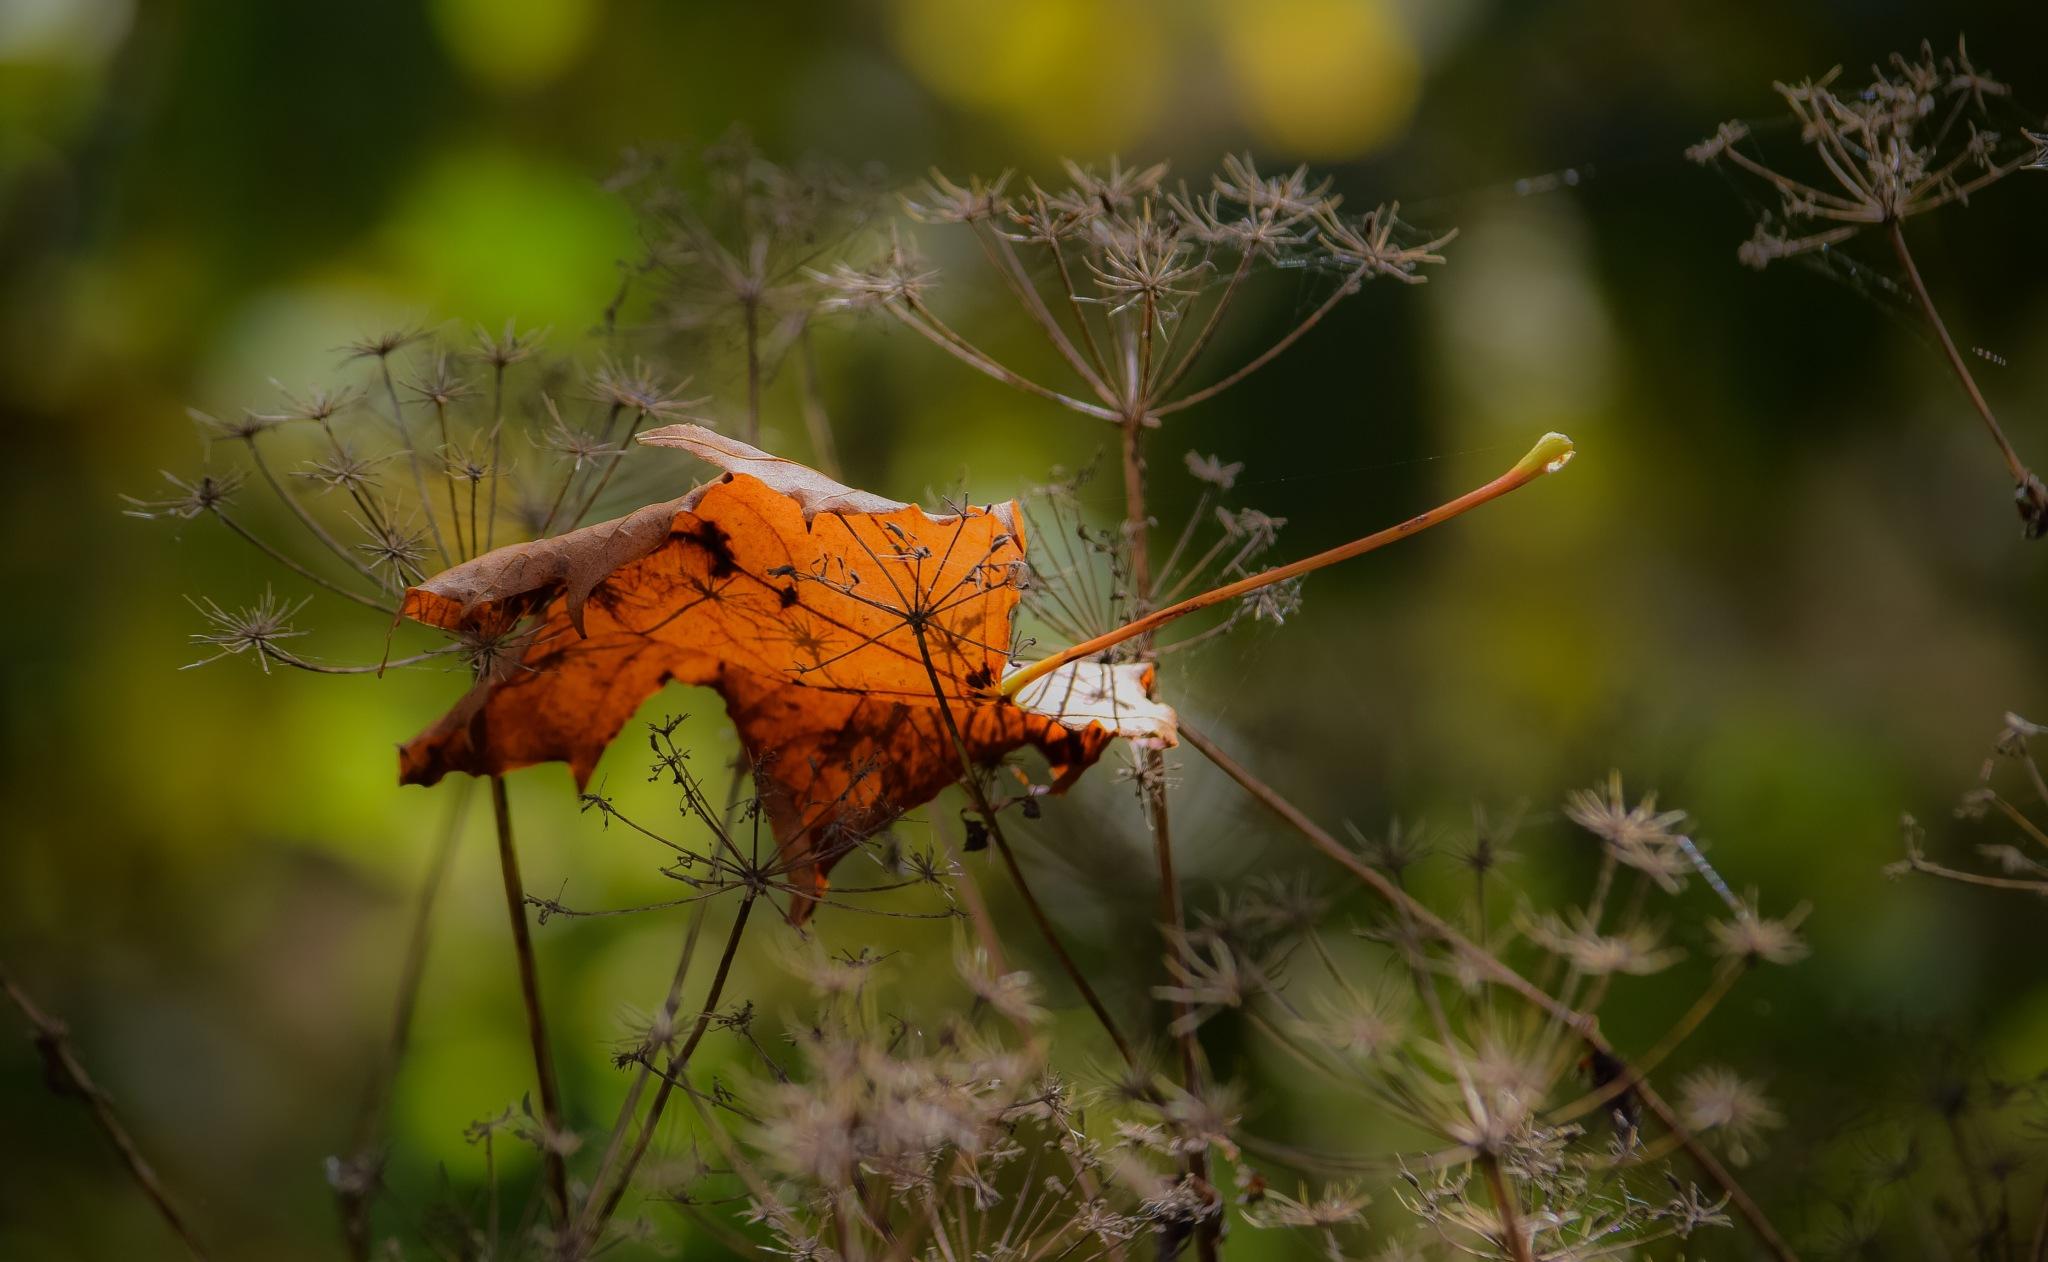 The autumn is near by RONNIE ERICSON